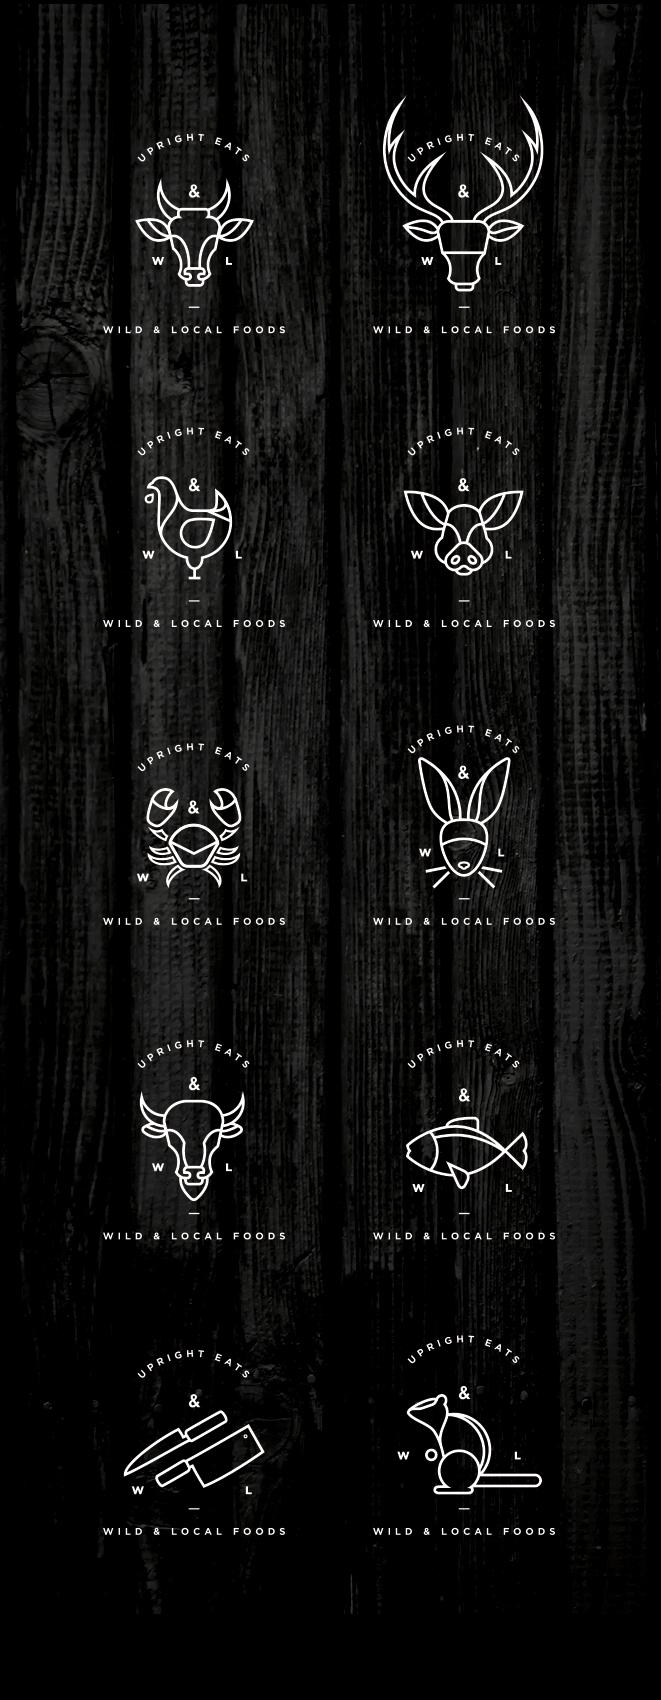 W+L_Logos_all.jpg